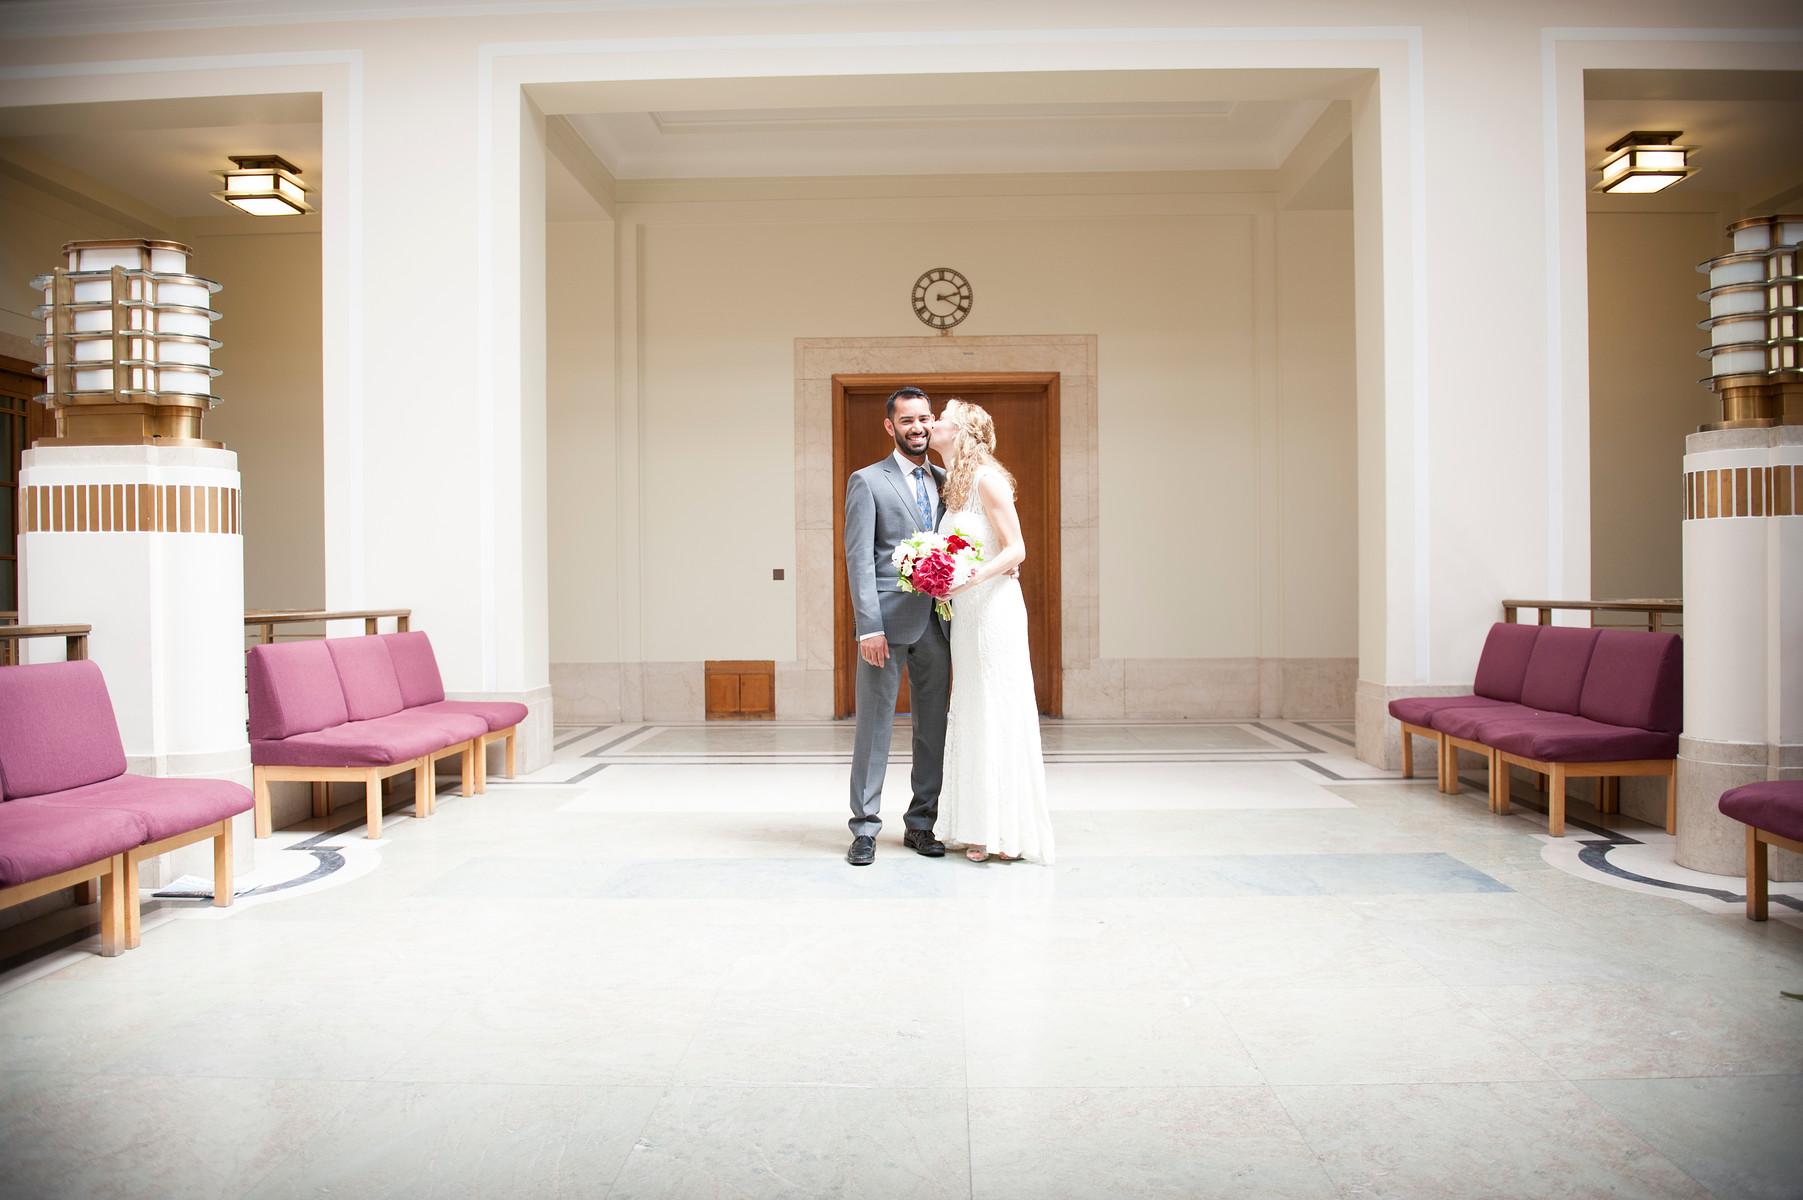 Raziq Rauf & Stella Ferguson // Wedding 2014